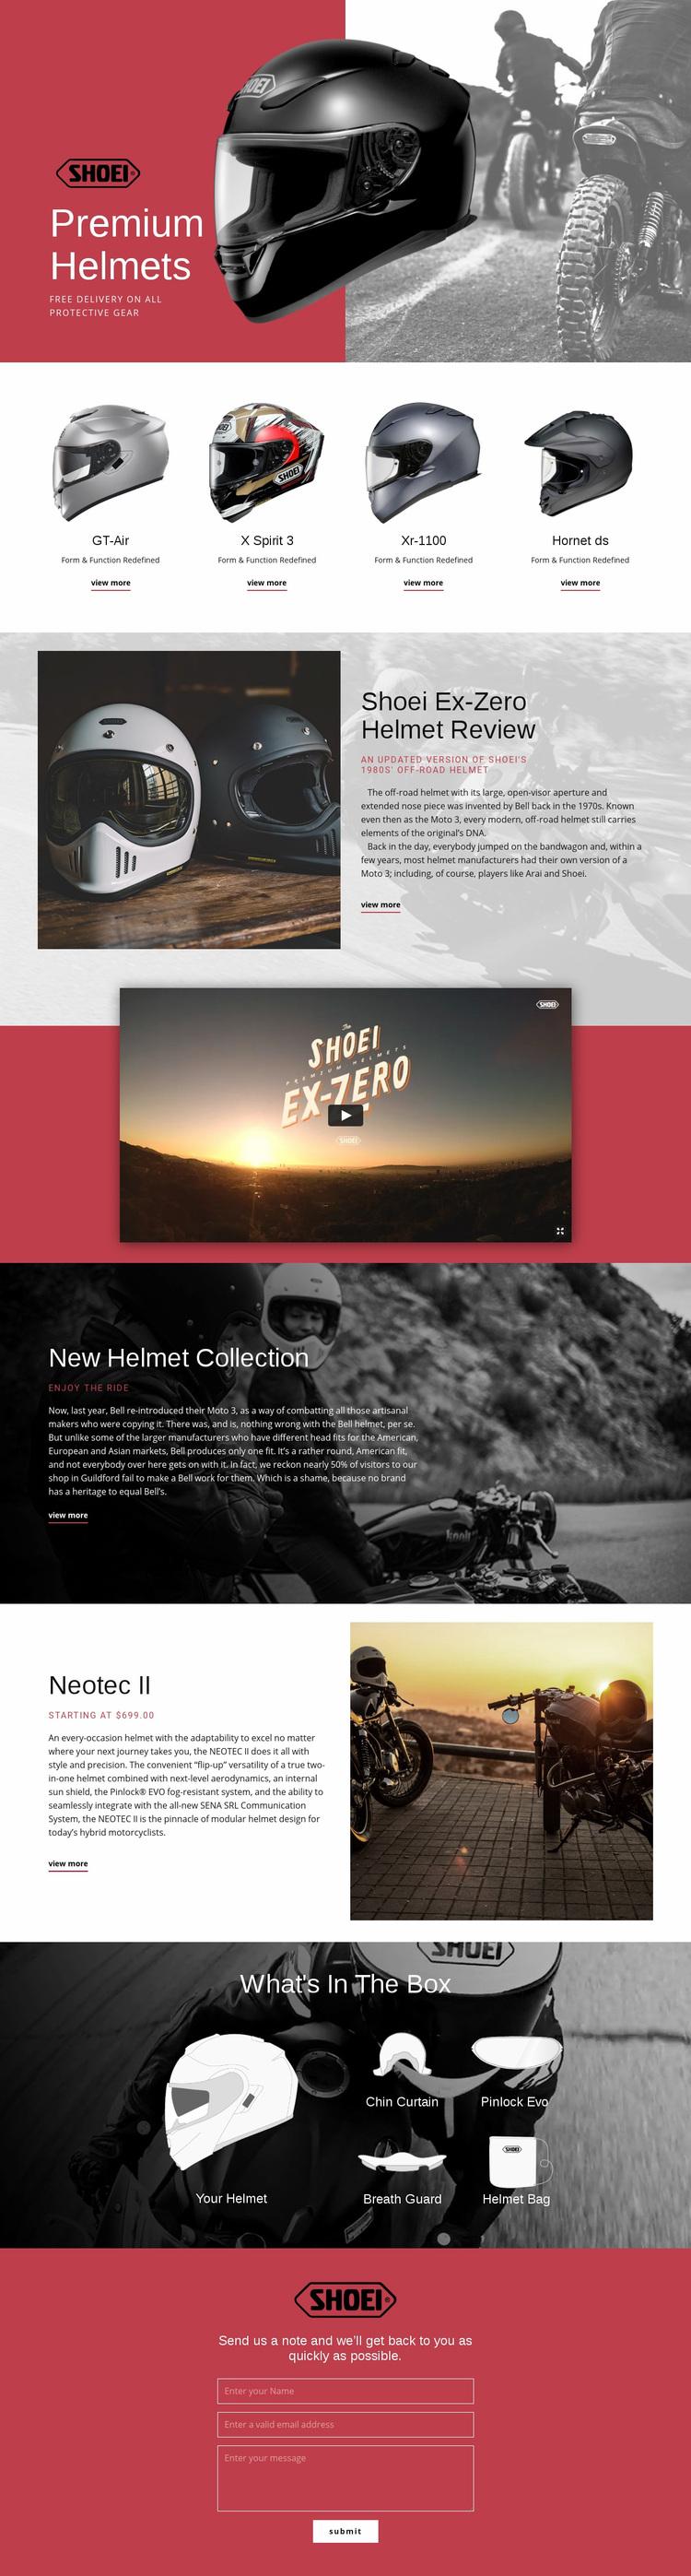 Premium Helmets Web Page Designer